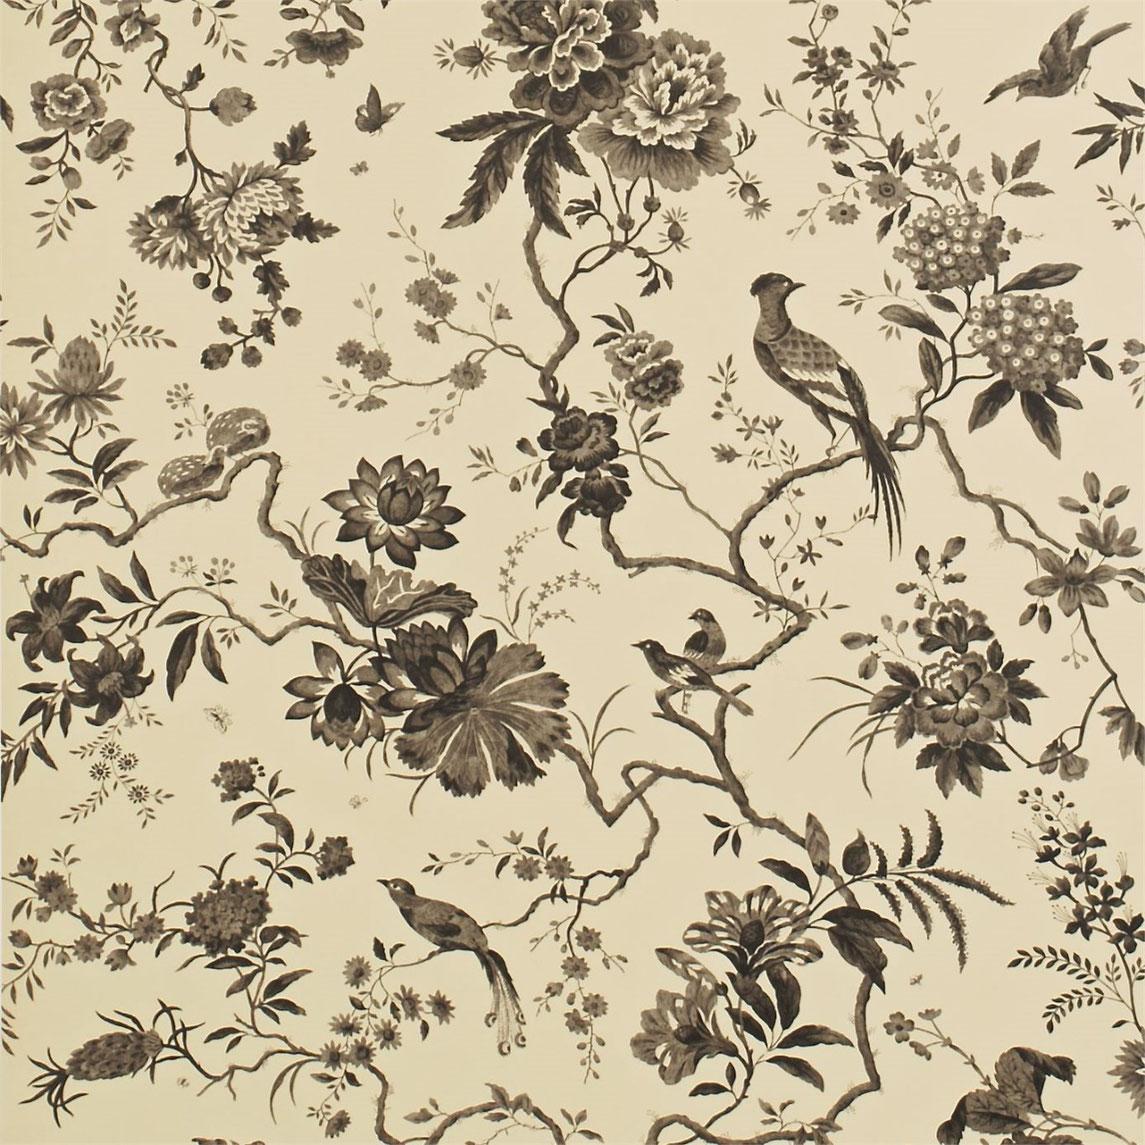 Size up to 960 x 320 cm. Carta Parati Classica Toile Elegance Italian Vintage Sofa